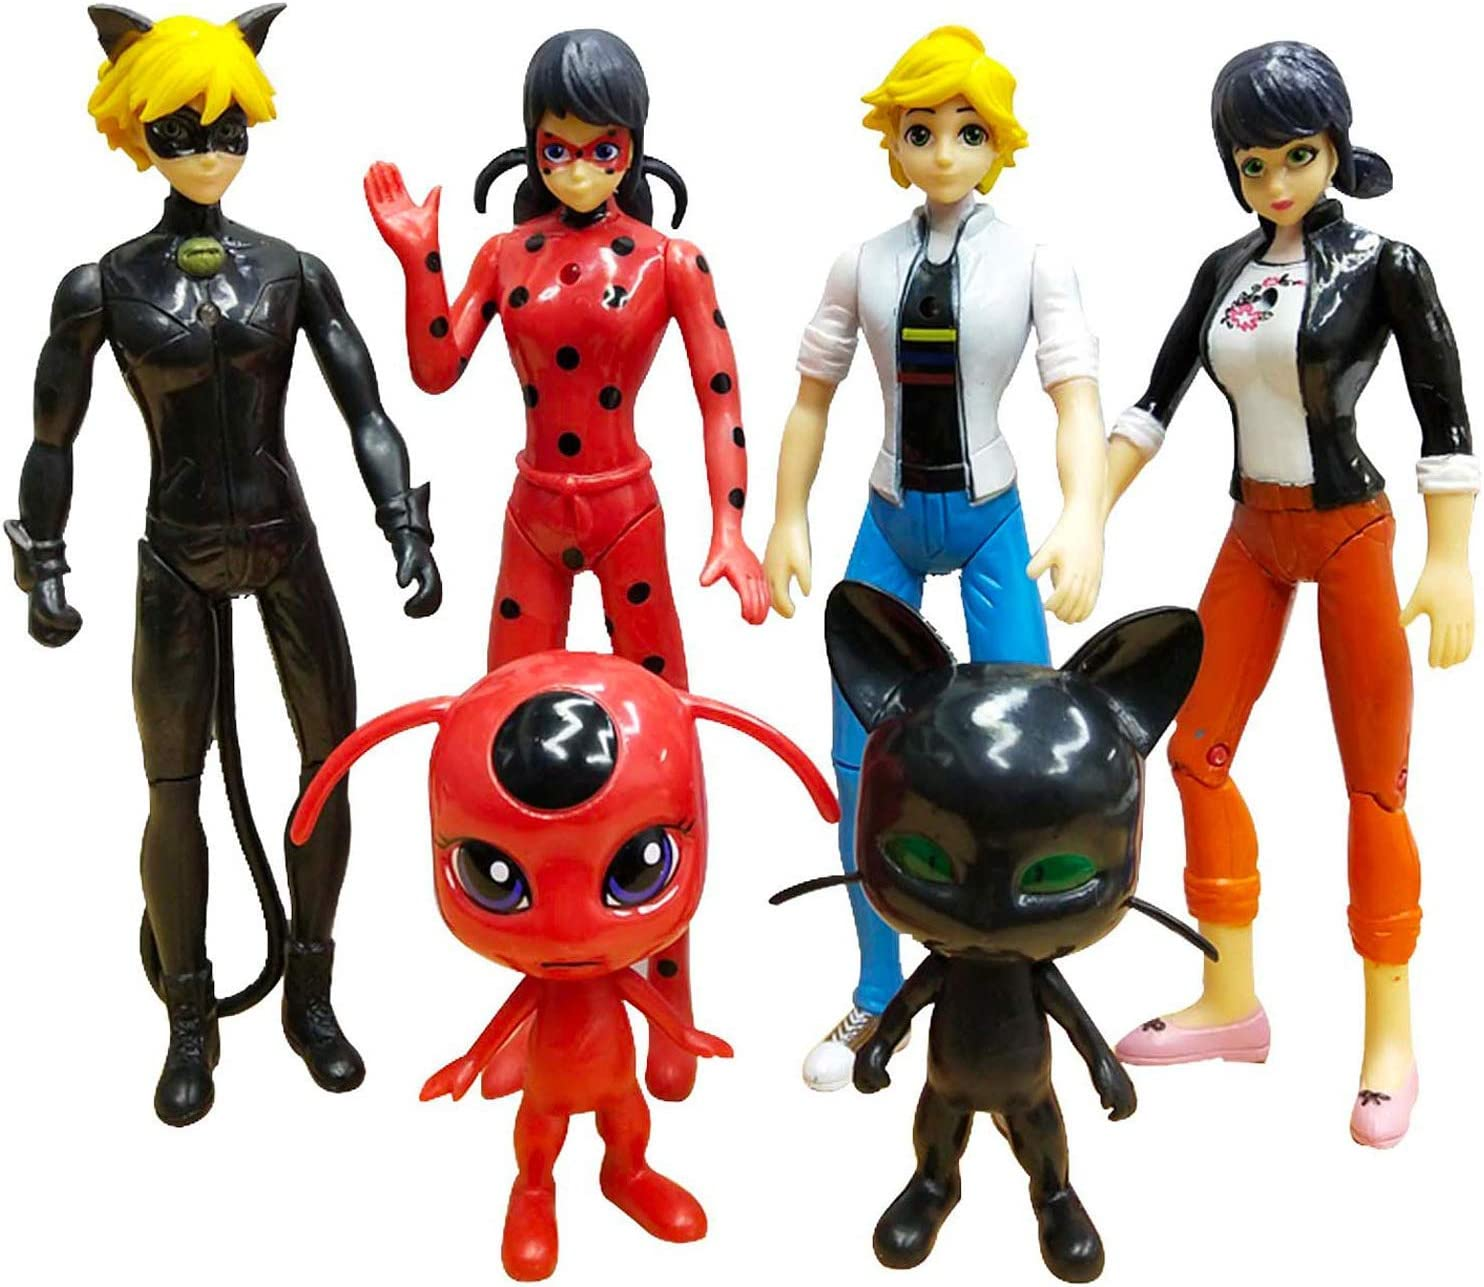 Jubasix Ladybug 6pcs Action Figure and cat Noir Miraculous Action Figures - Miraculous Toy Set Minifigures Tikki Dolls 6 Set